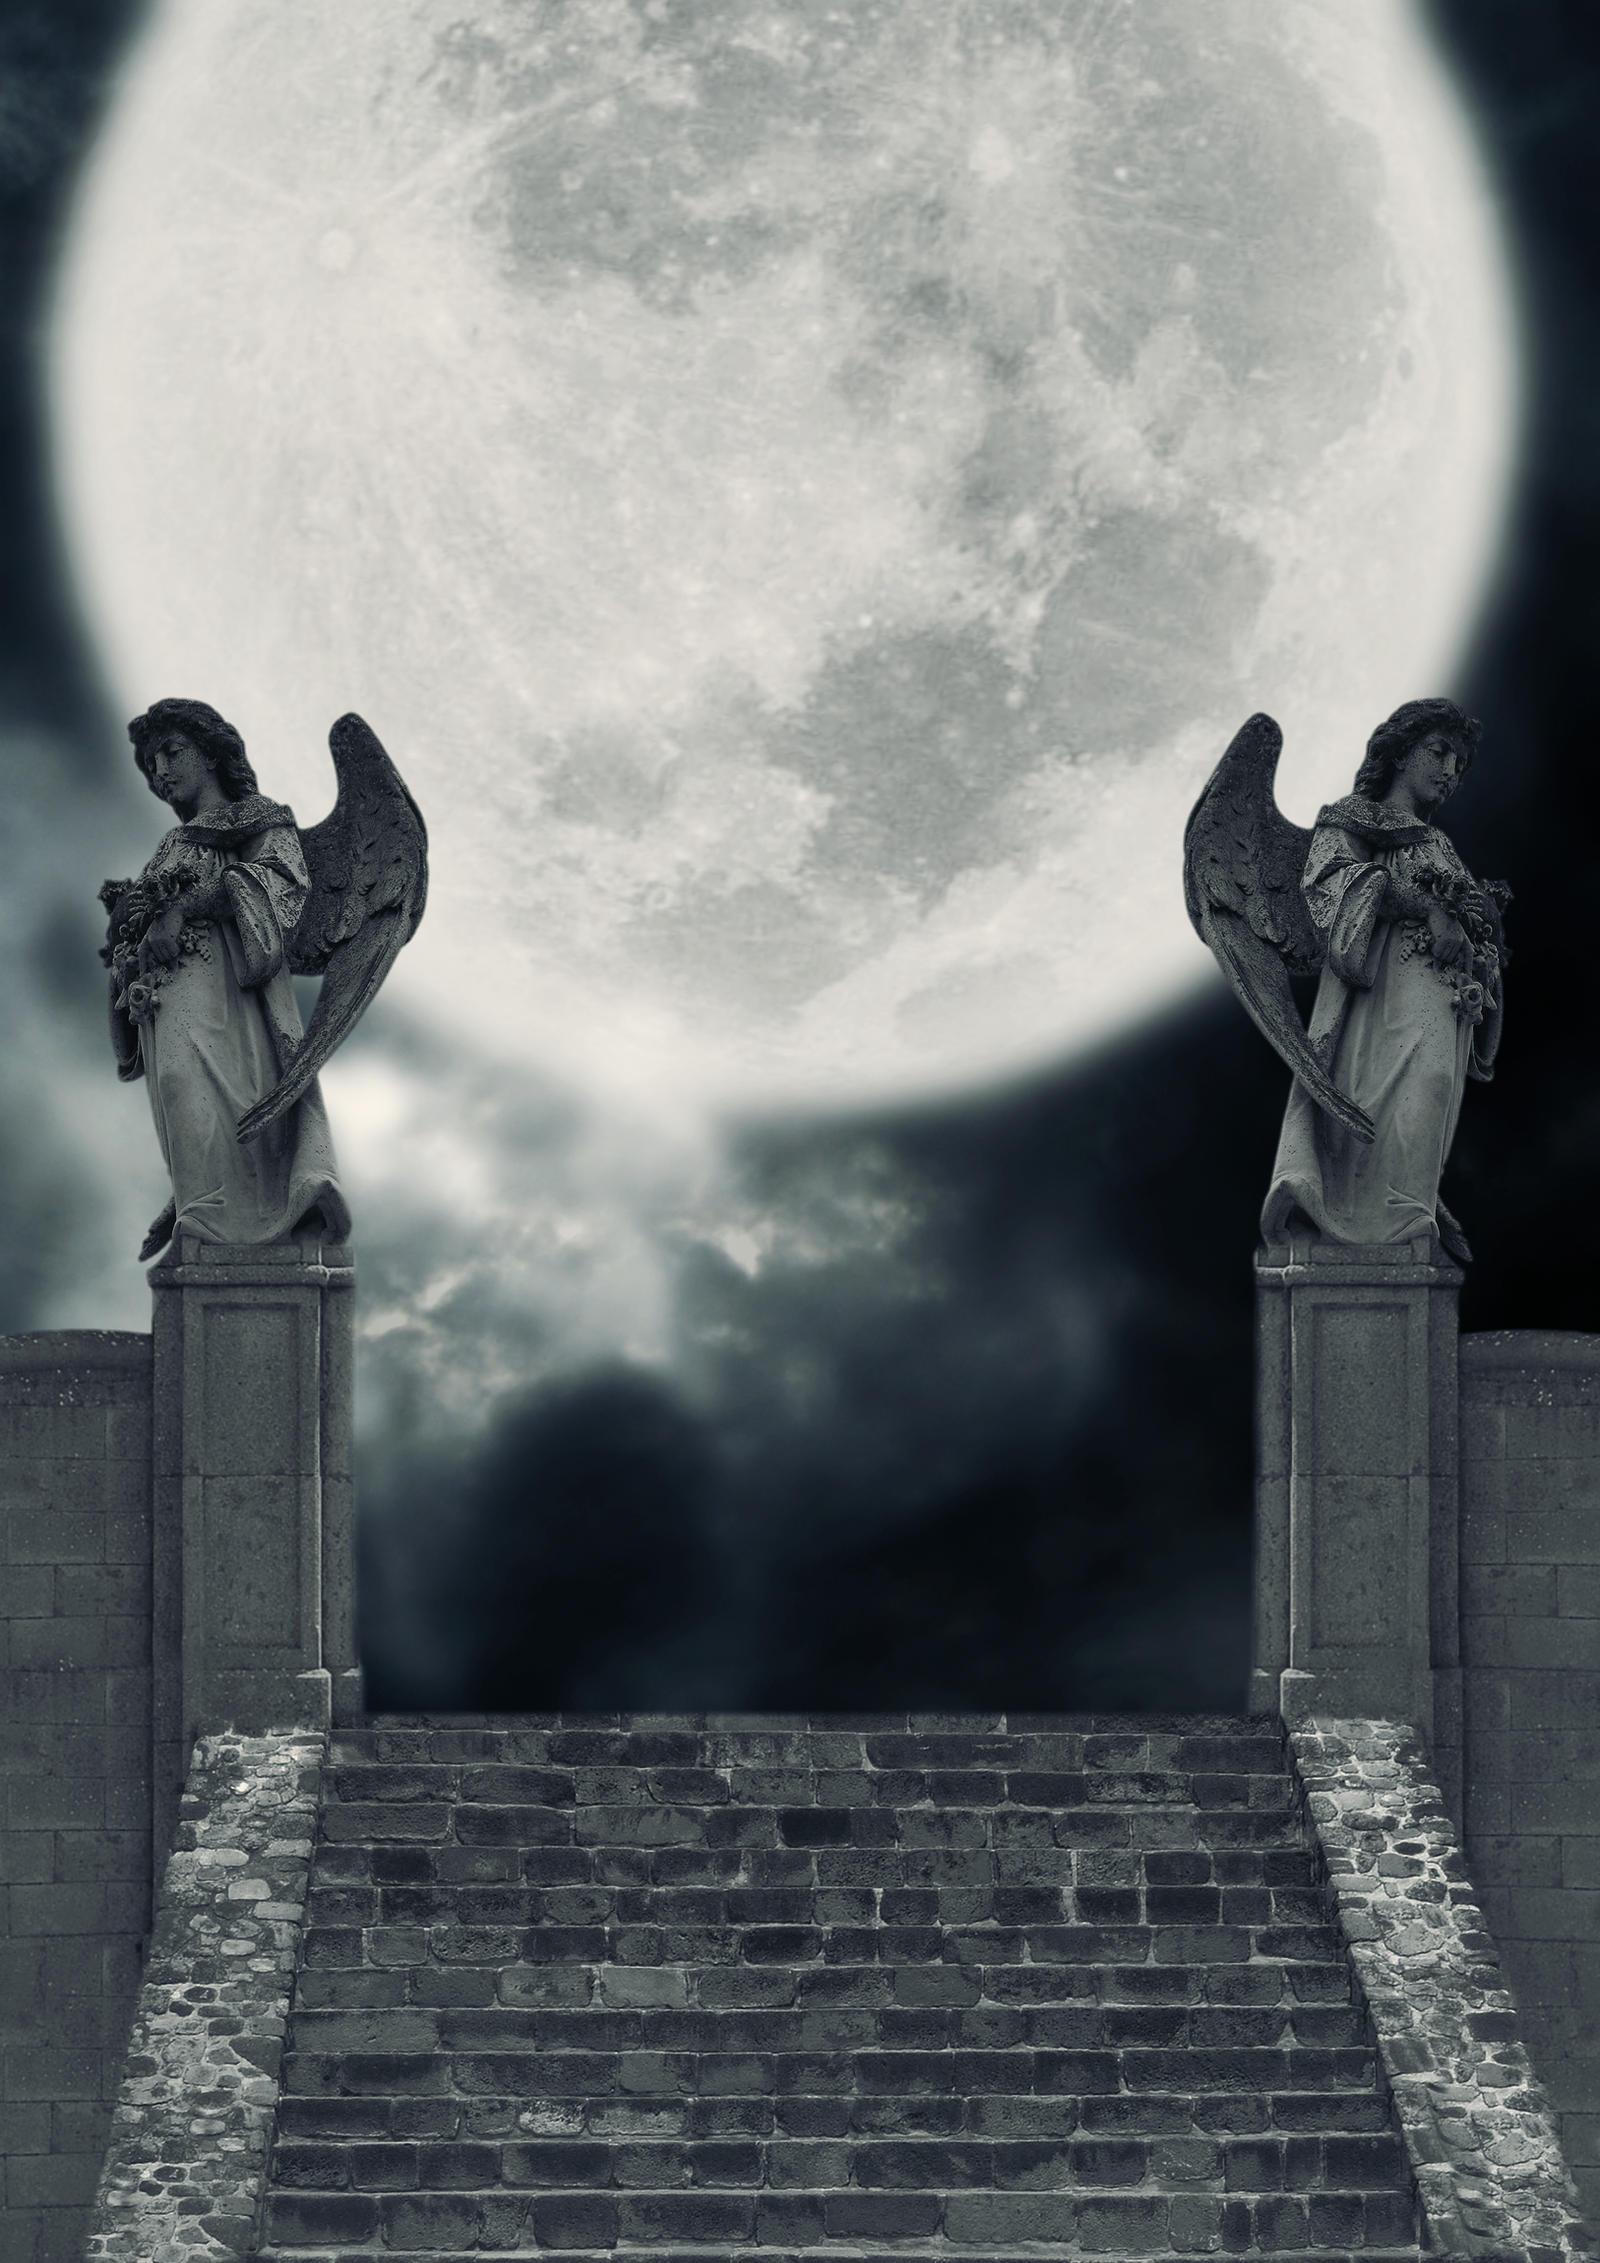 Moon Realm BG by the-night-bird